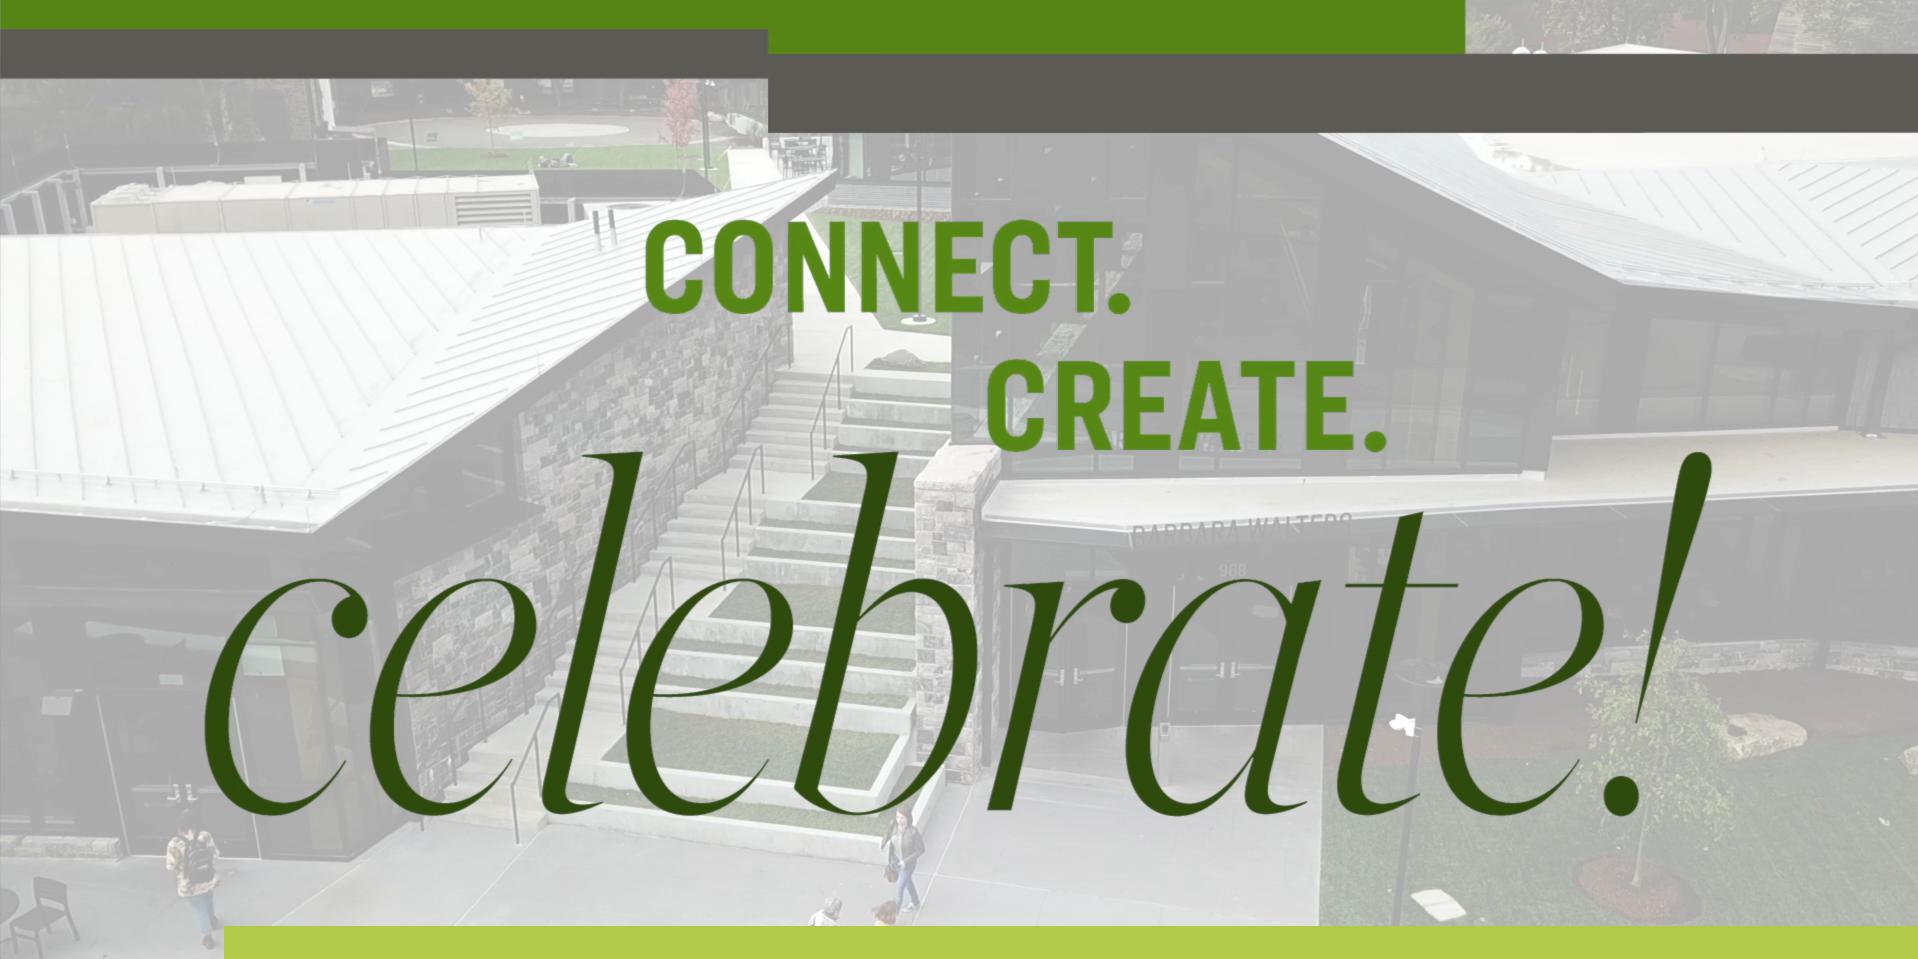 Connect. Create. Celebrate.